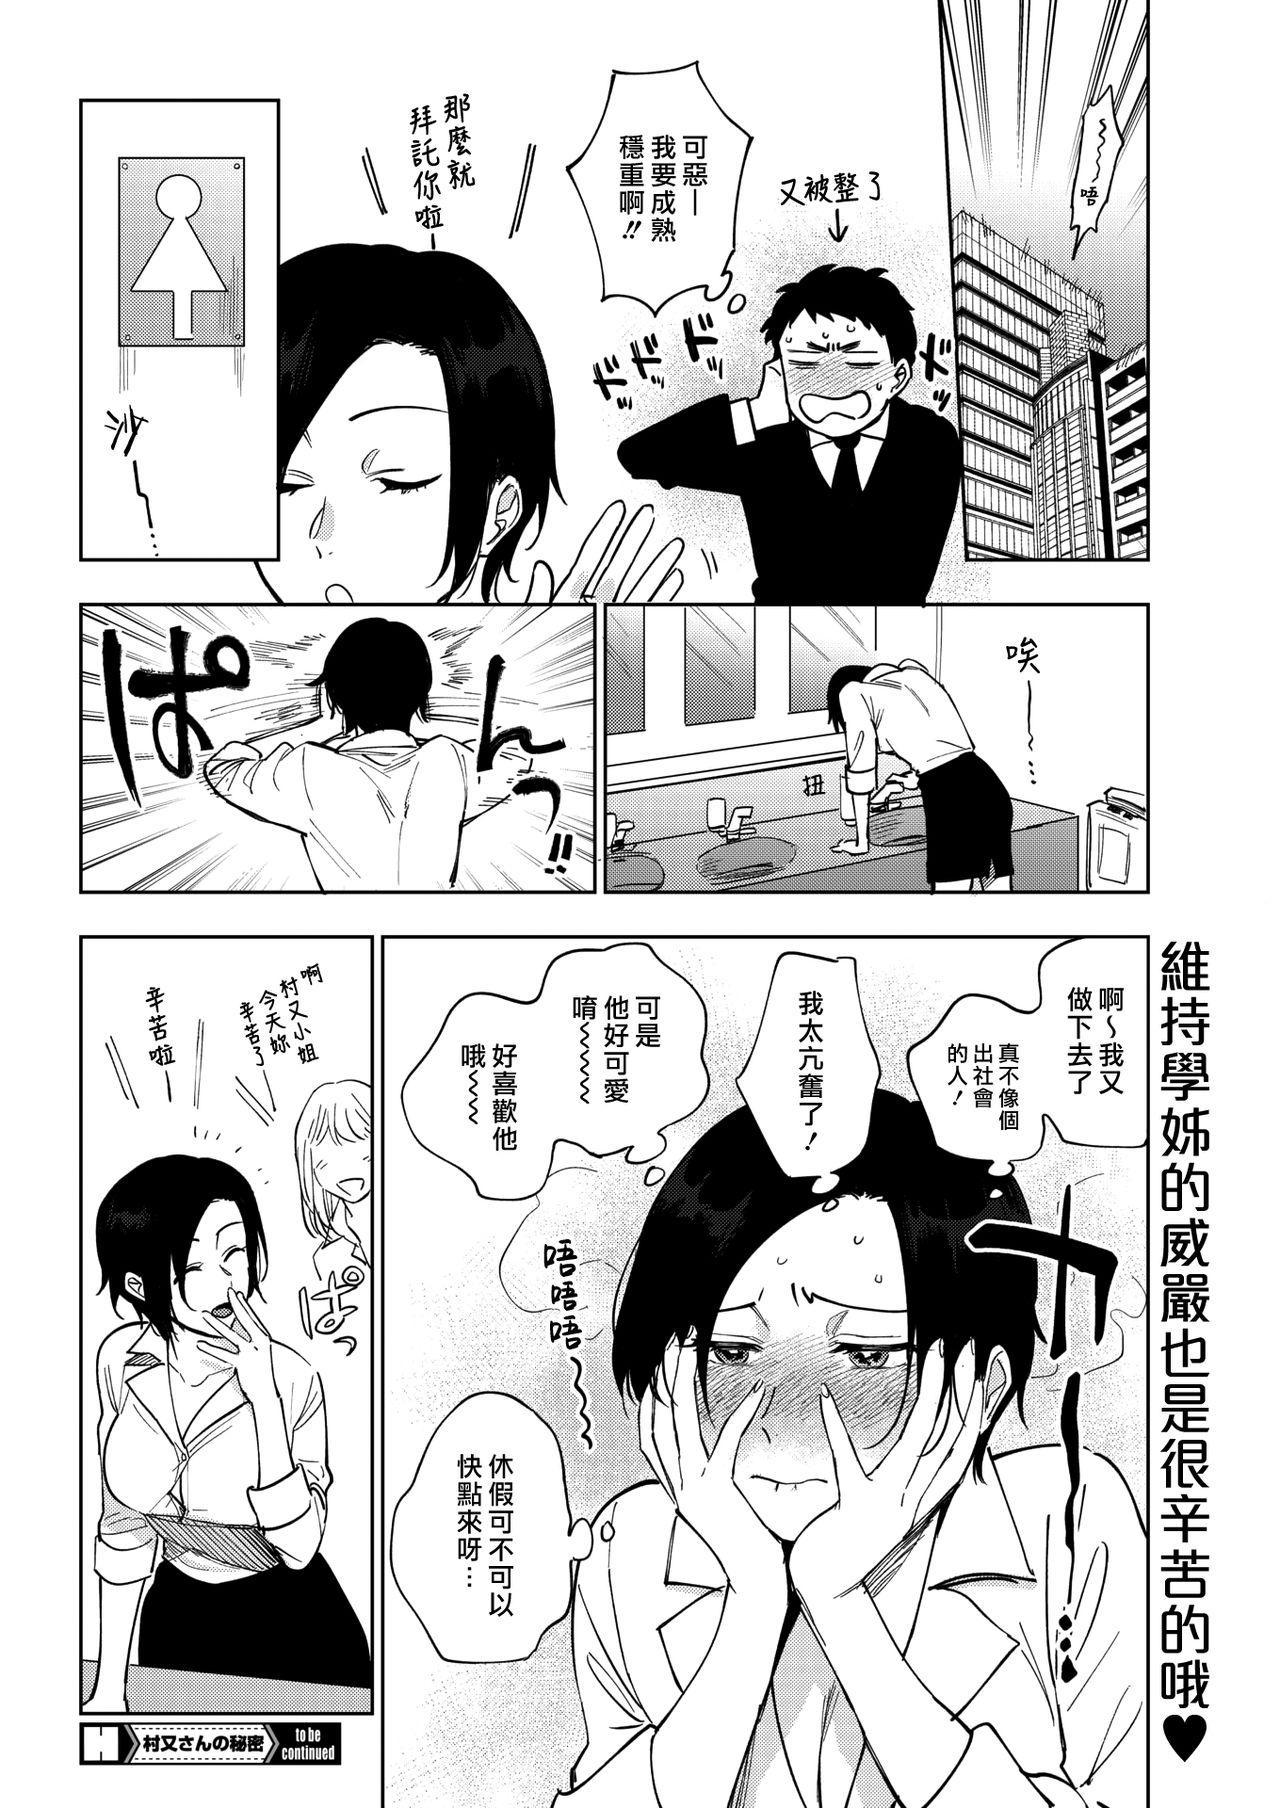 Muramata-san no Himitsu 2 | 村又小姐的秘密 2 25